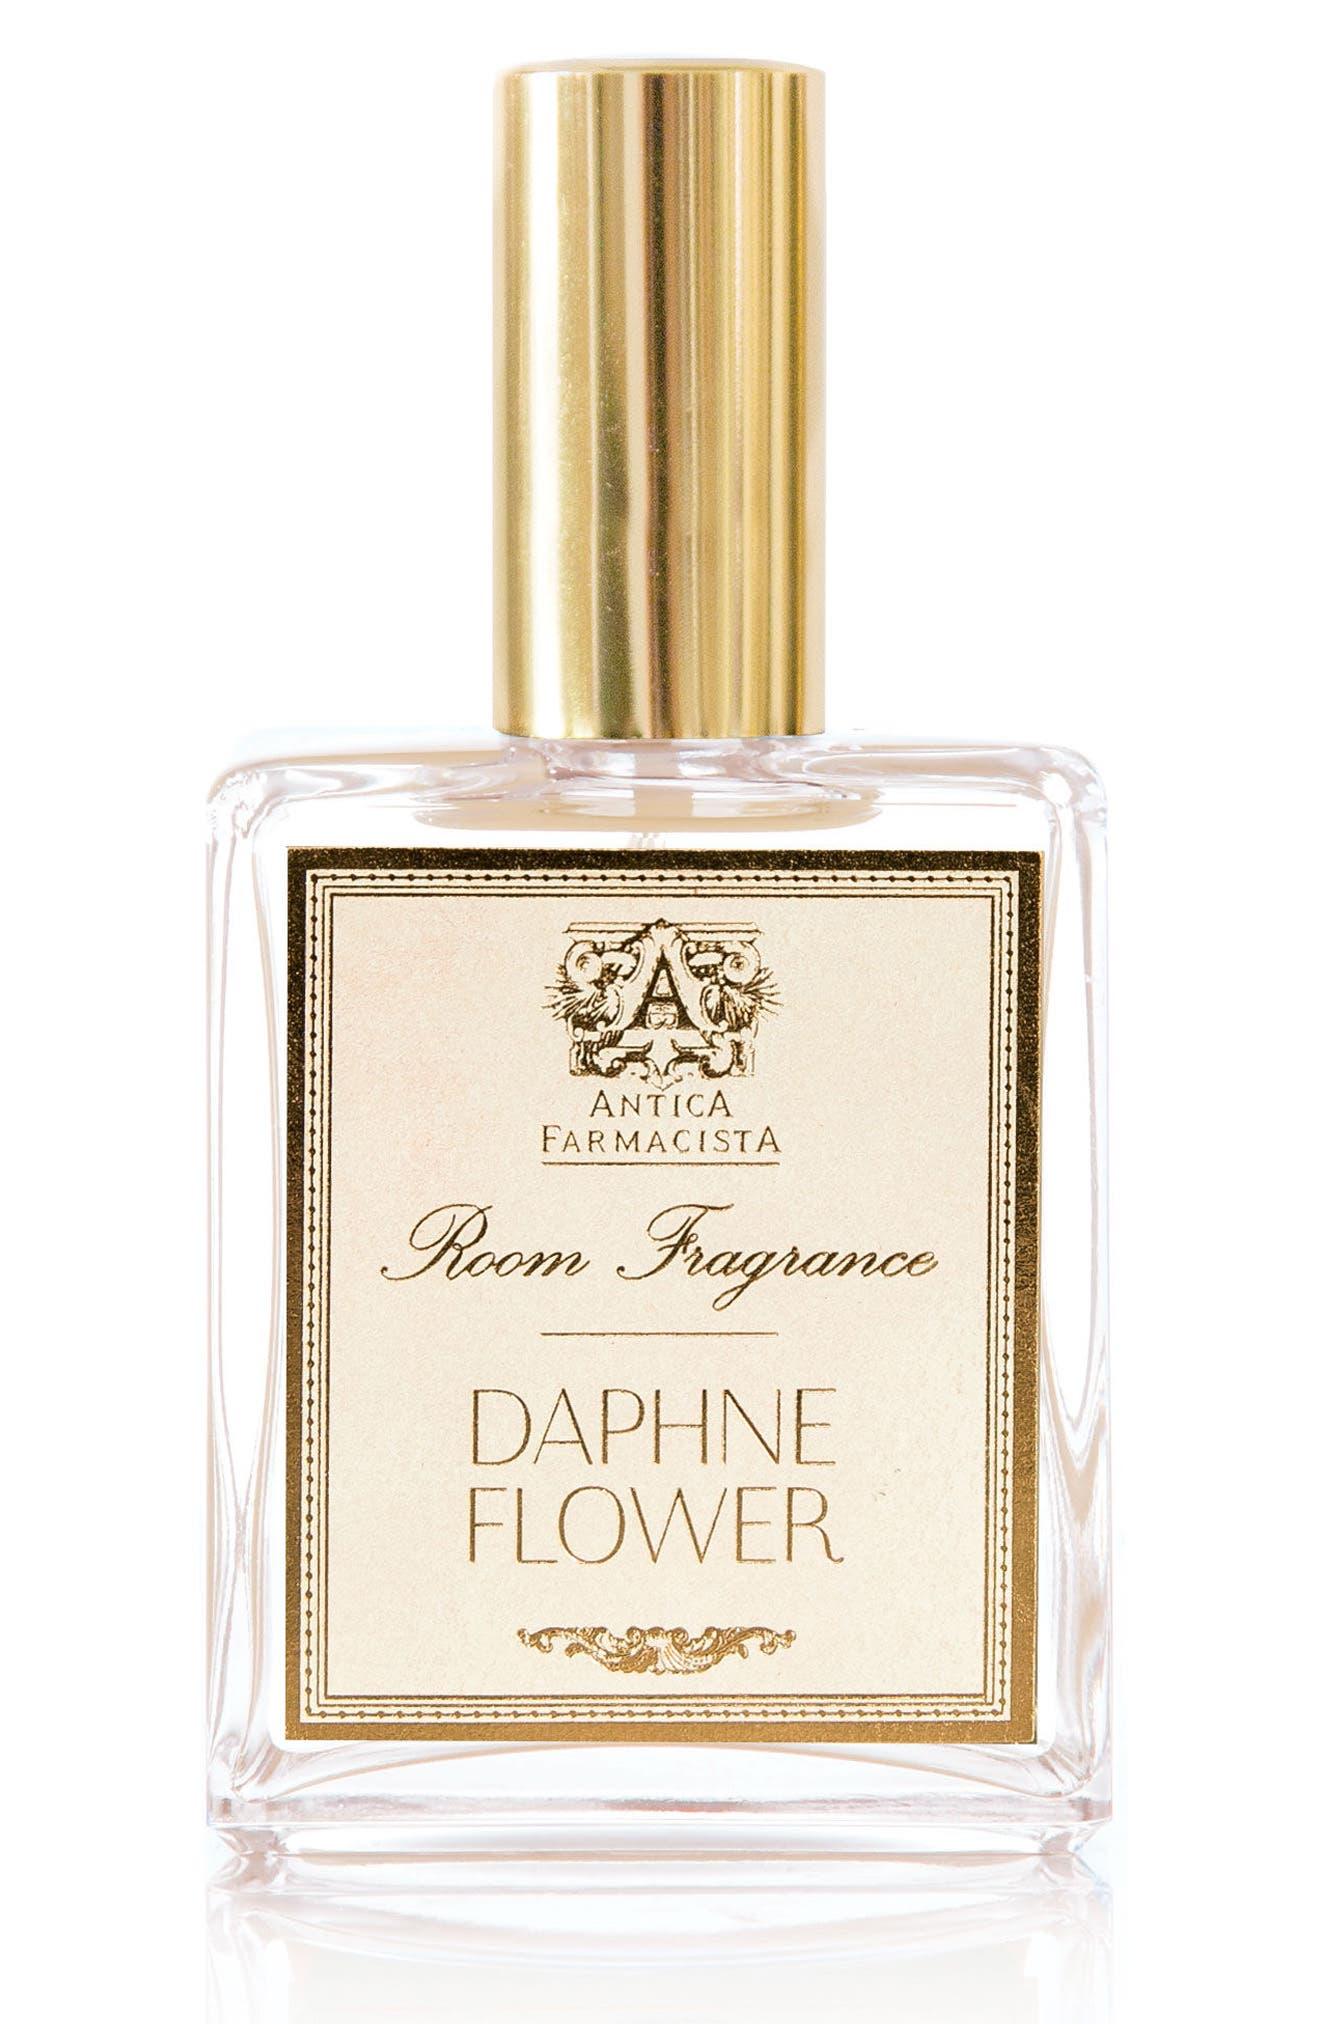 Daphne Flower Room & Linen Spray,                             Main thumbnail 1, color,                             NO COLOR